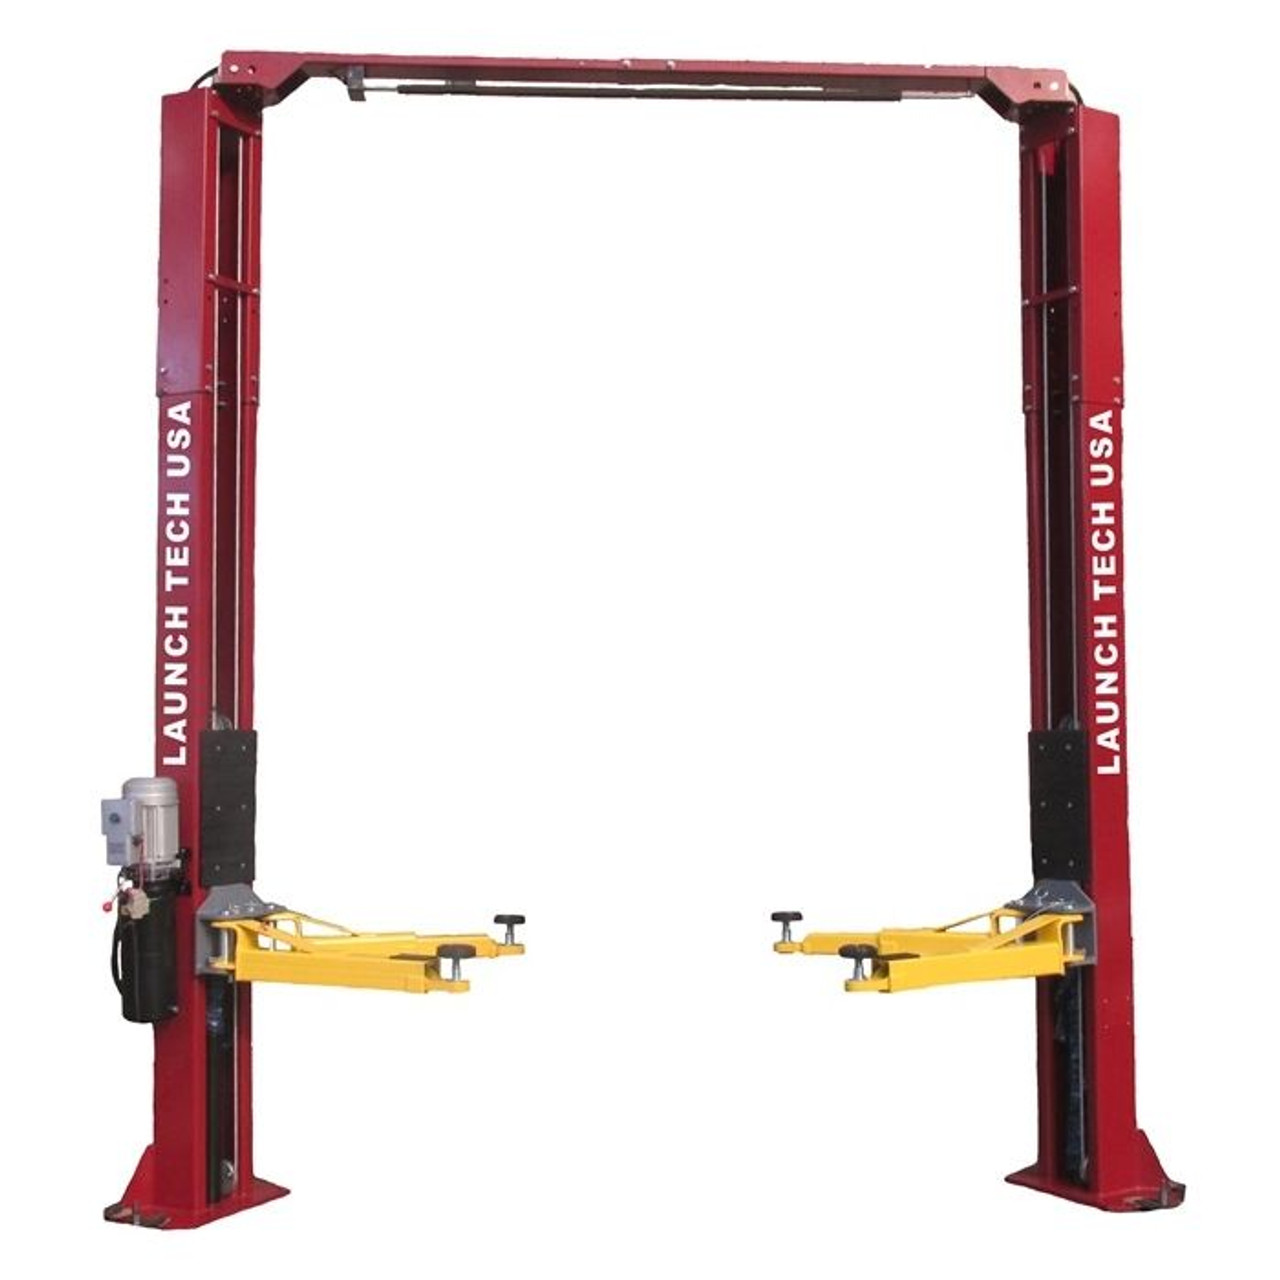 LAUNCH TLT240SC-R Asymmetric 2 Post Lift